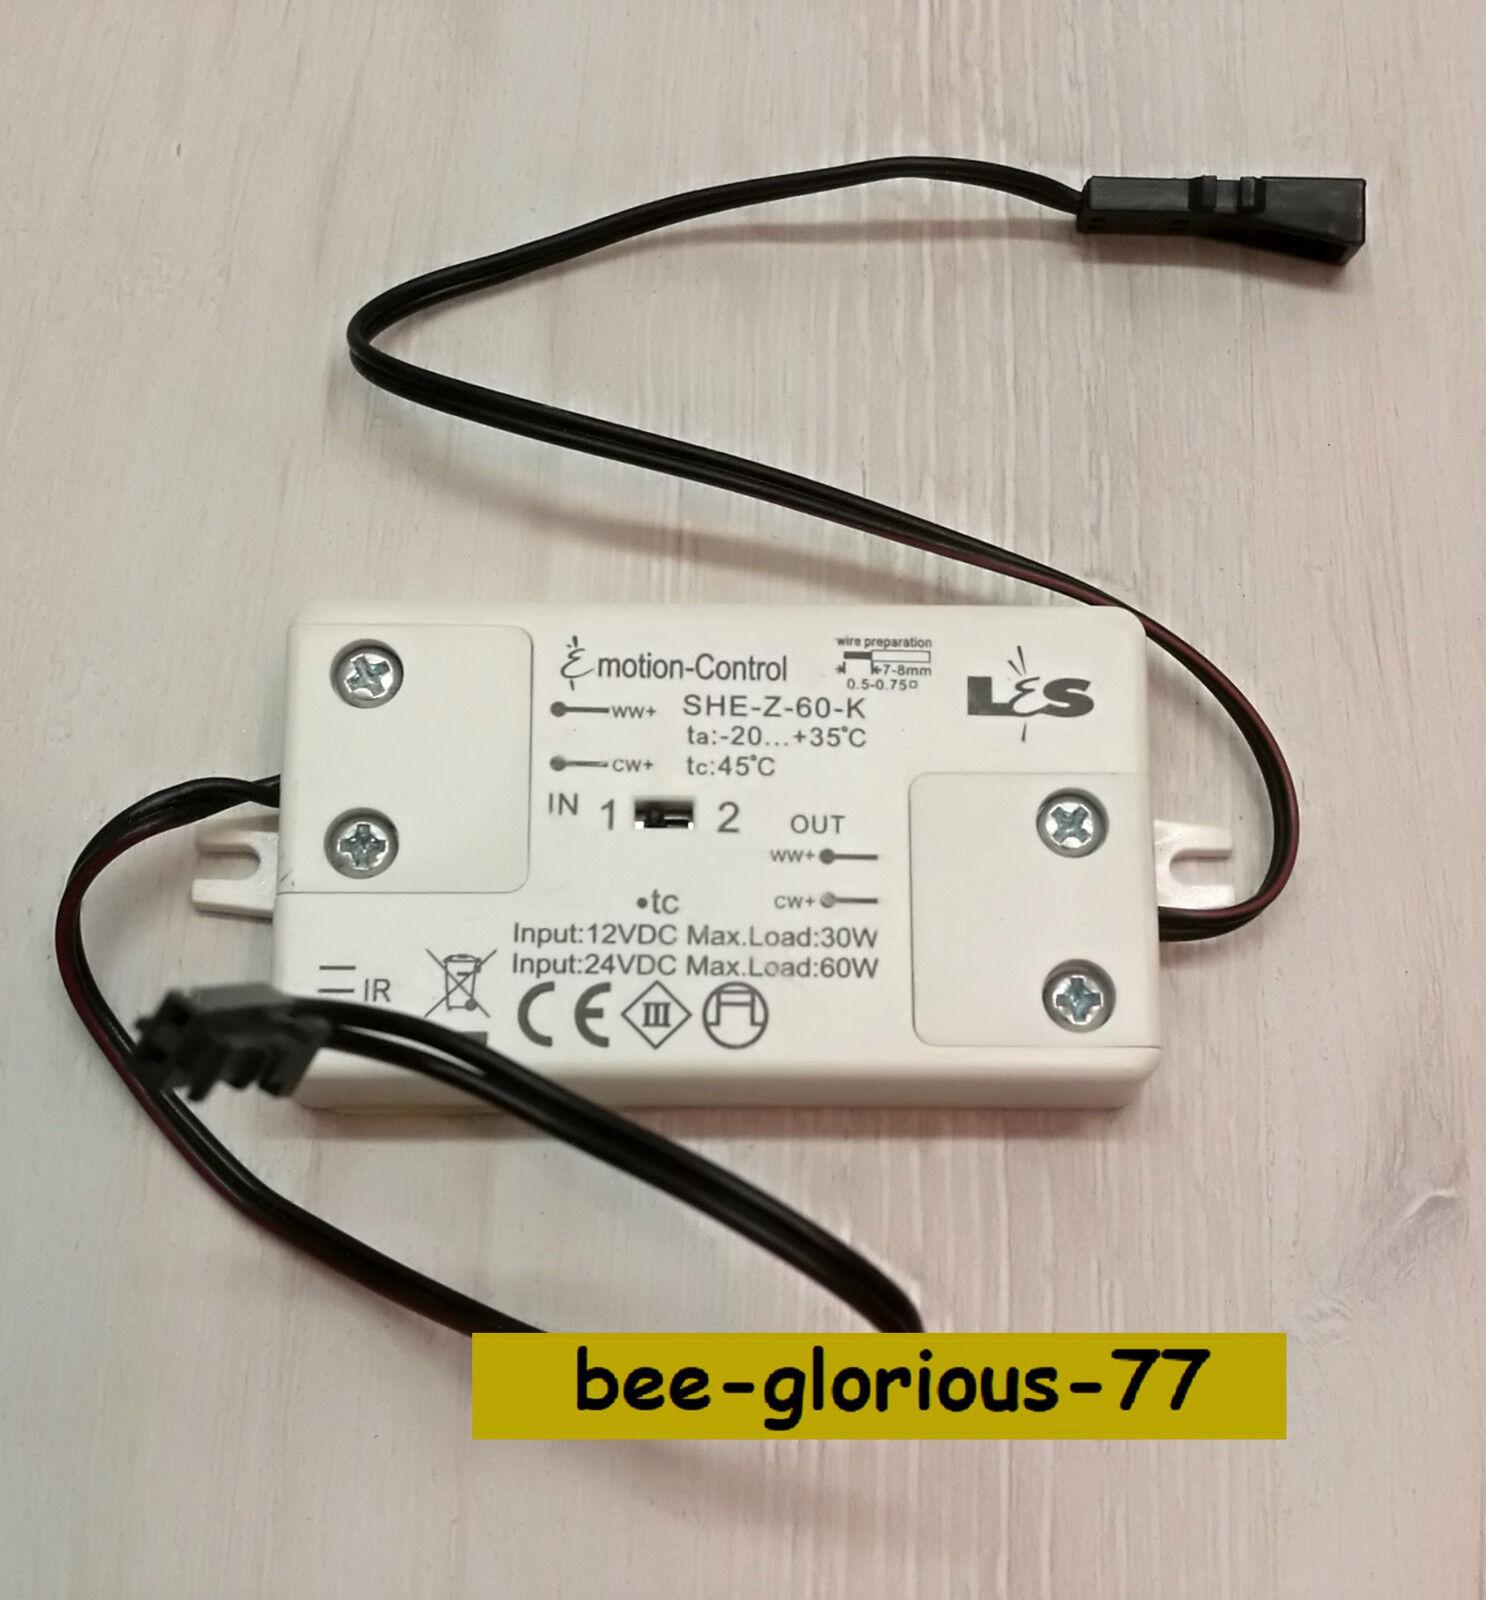 Naber Lumica L&S LED Emotion Control Dimmer Funkempfänger